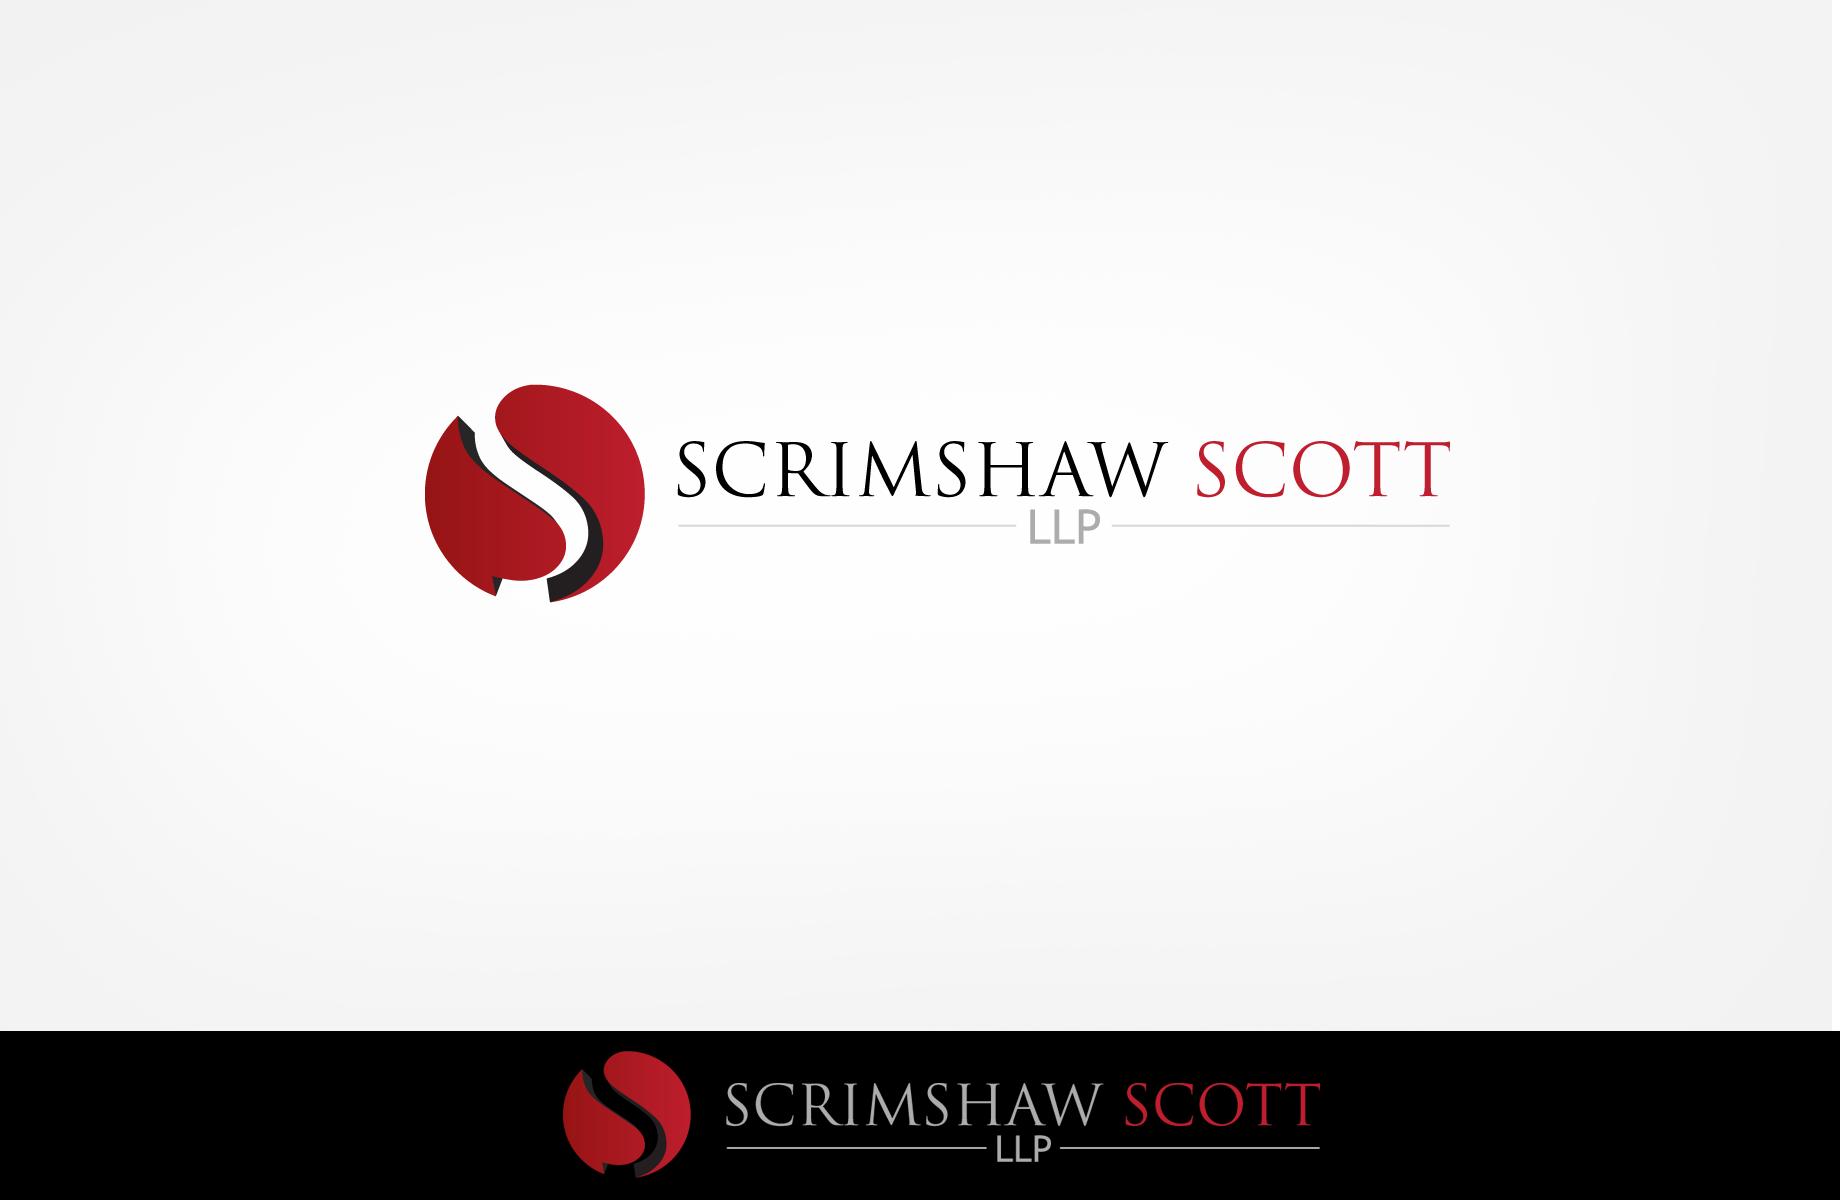 Logo Design by Jan Chua - Entry No. 106 in the Logo Design Contest Creative Logo Design for Scrimshaw Scott LLP.